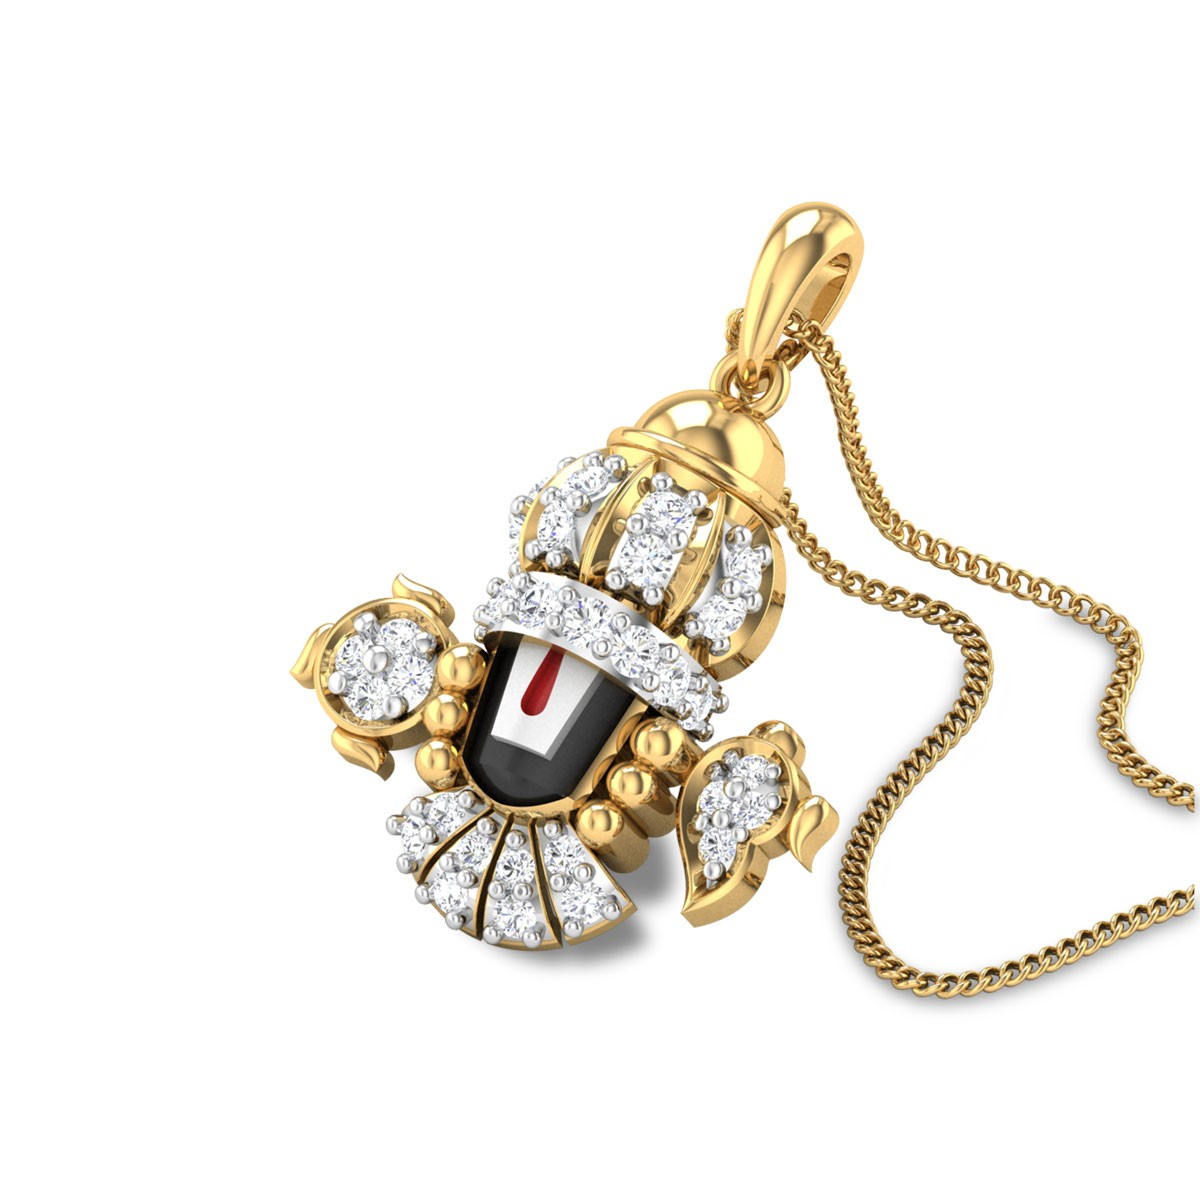 Srinibash Diamond Pendant